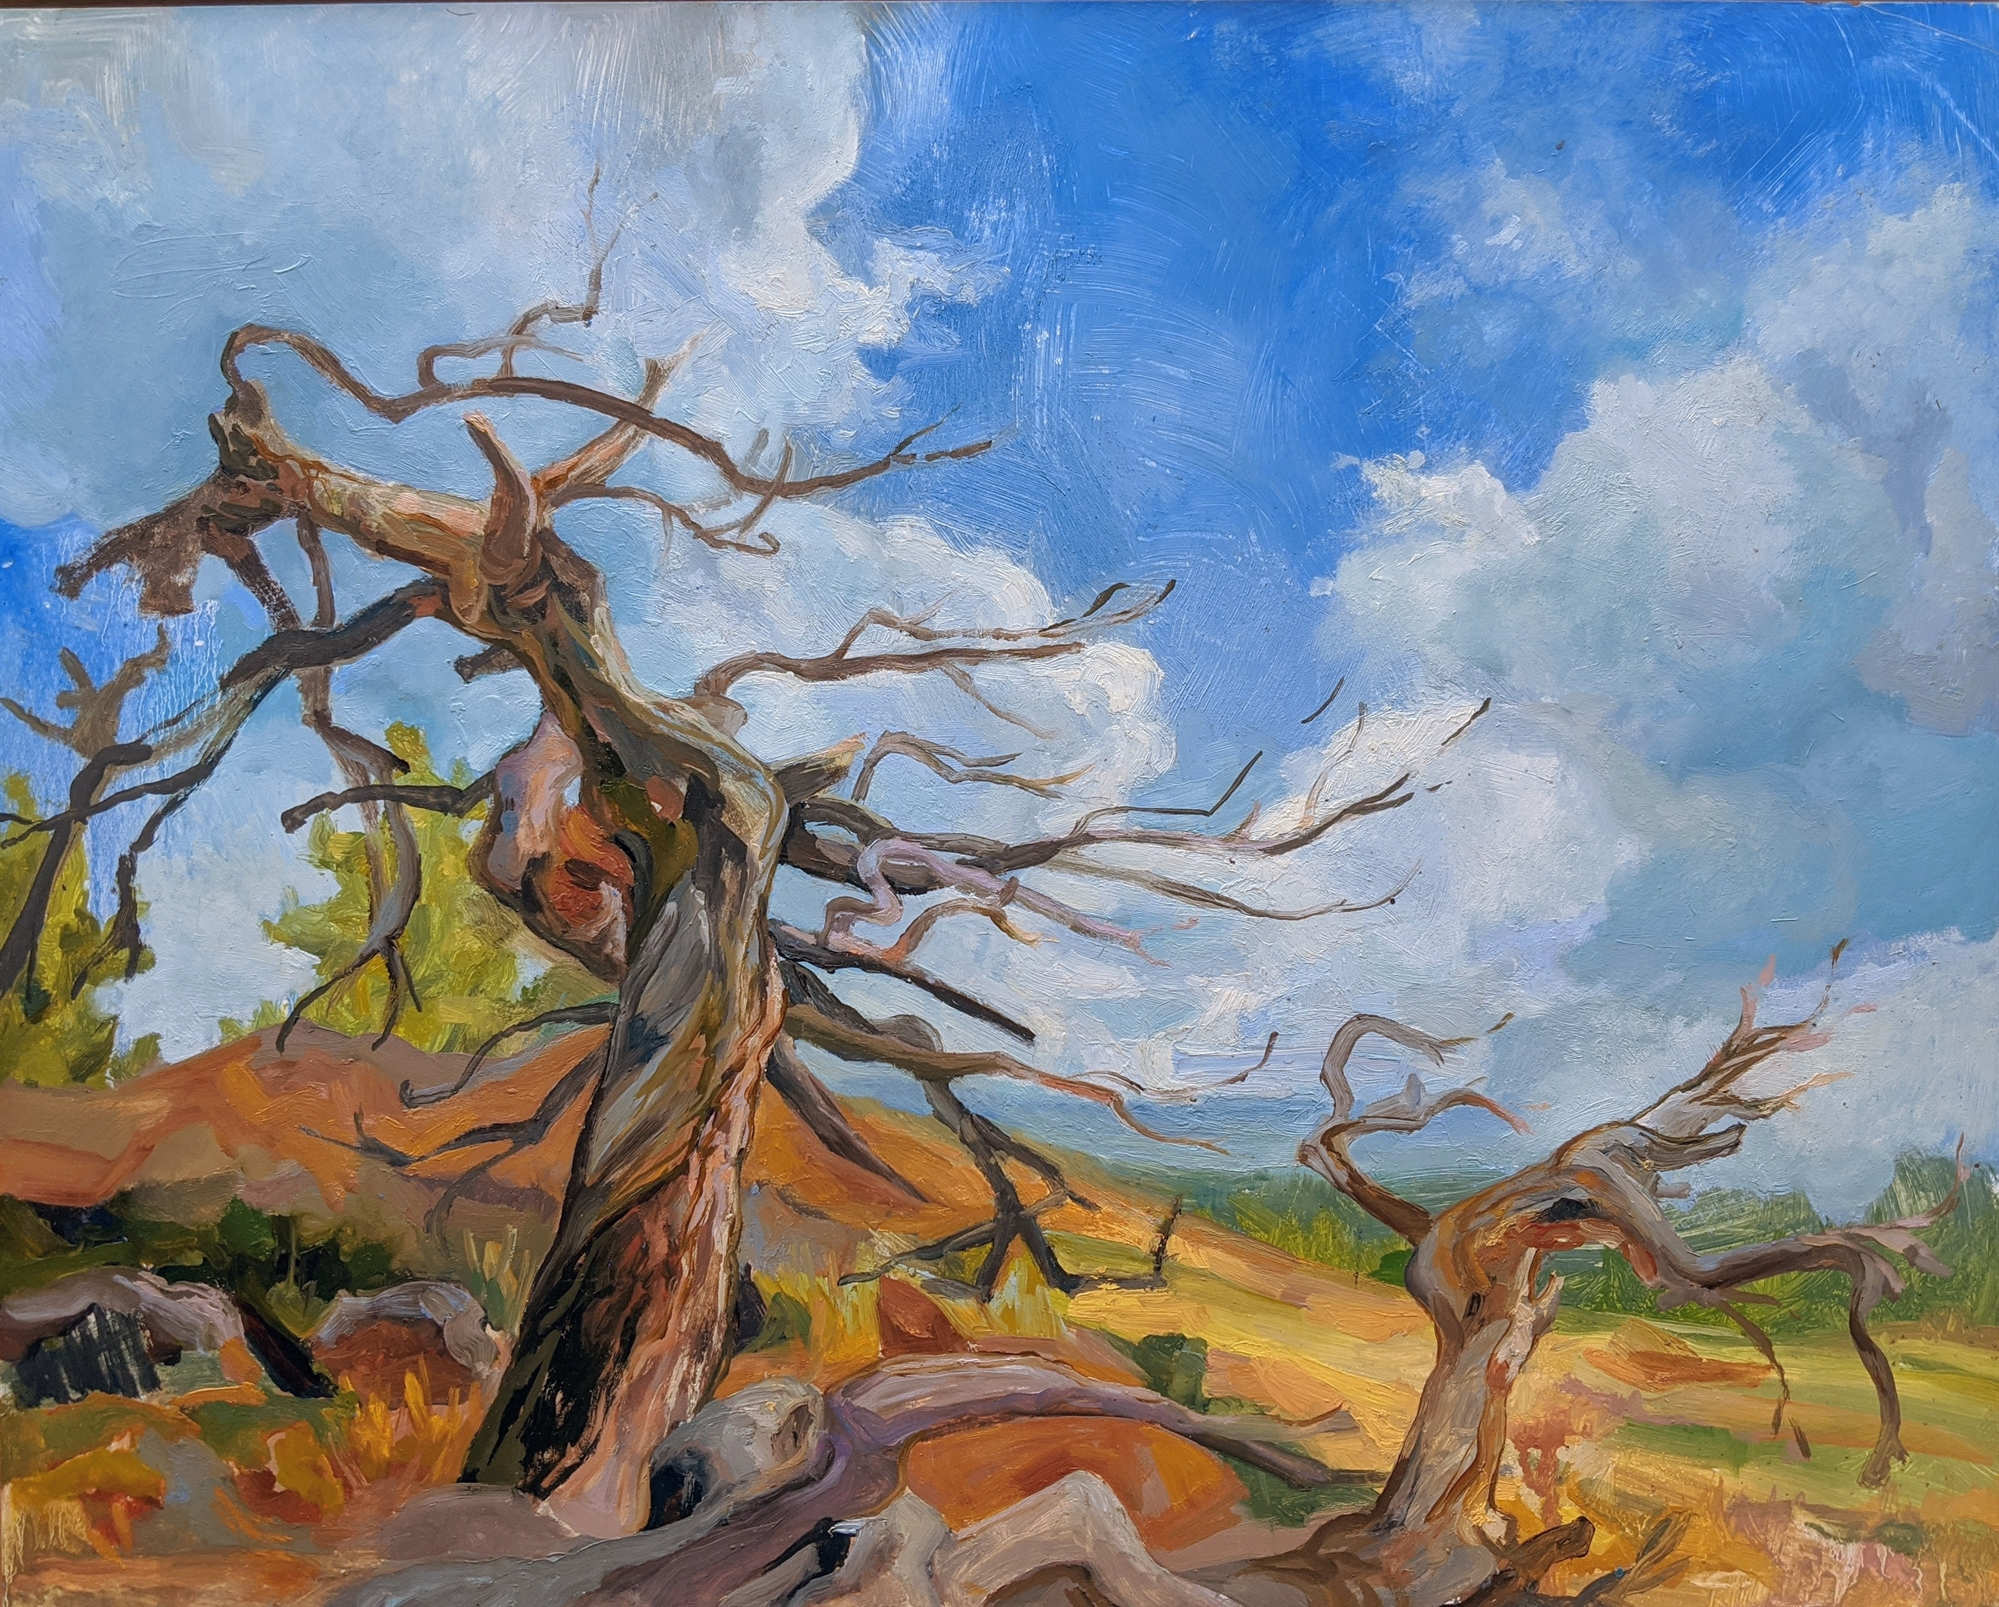 Caitlin's Tree by Charis Carmichael Braun